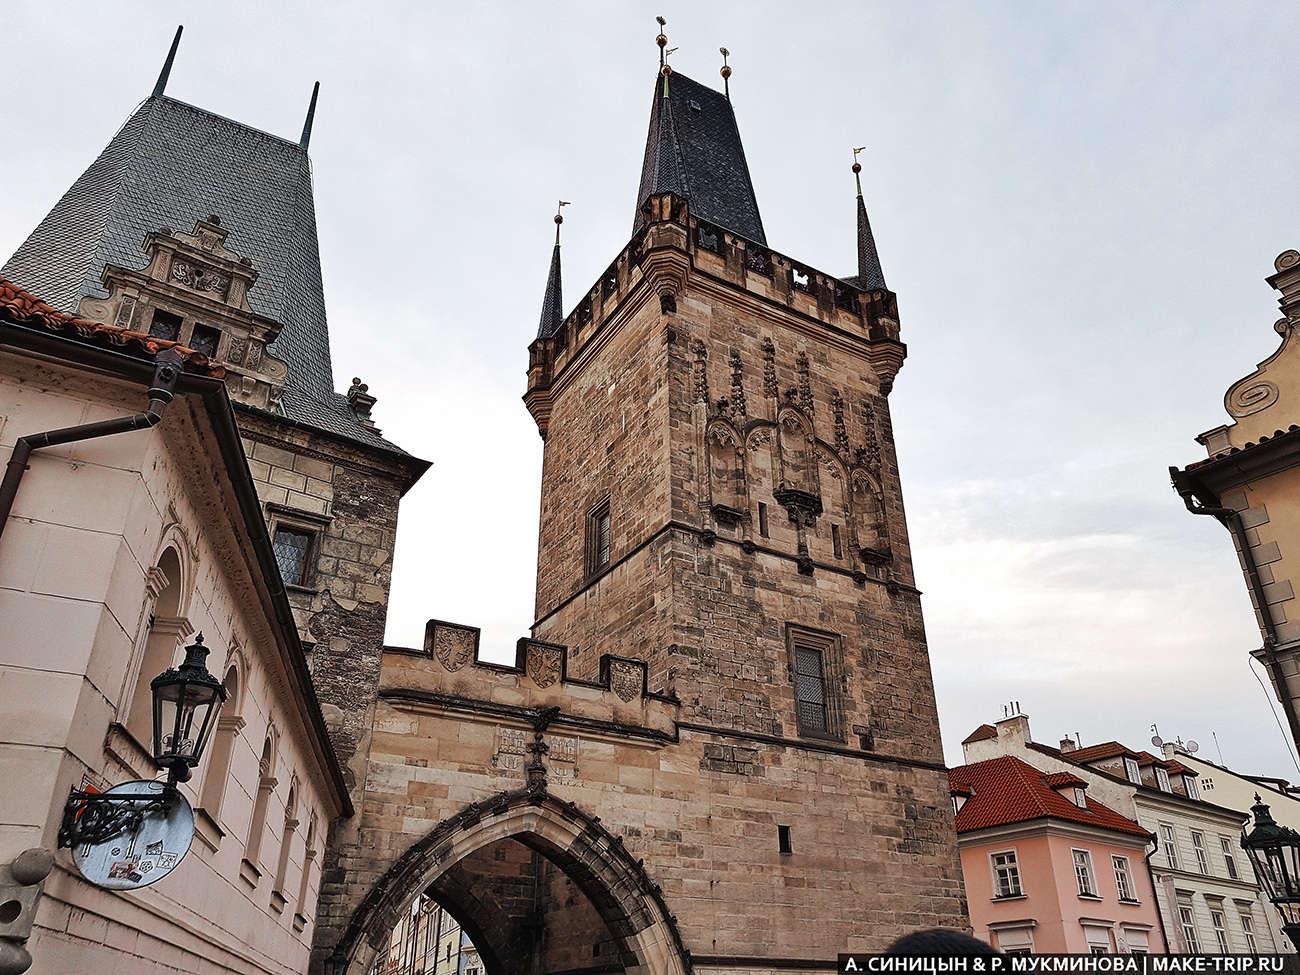 Температура воздуха в Праге по месяцам